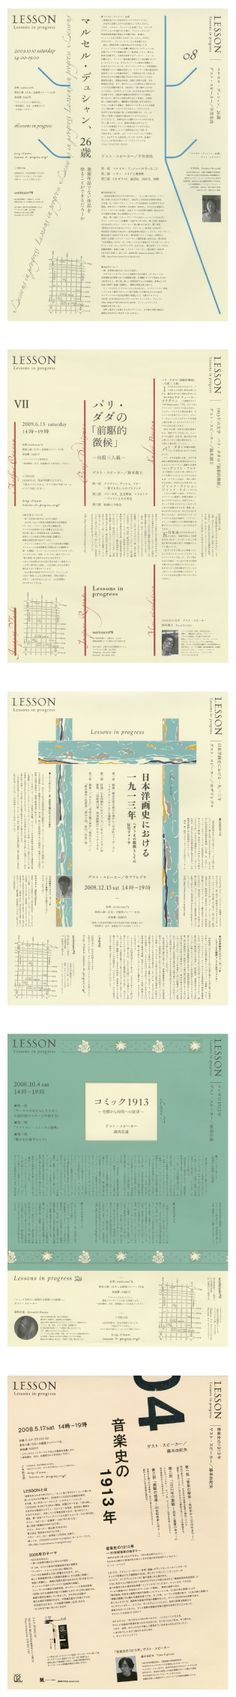 lesson by Atsushi Suzuki (鈴木篤) editorial layout ref.